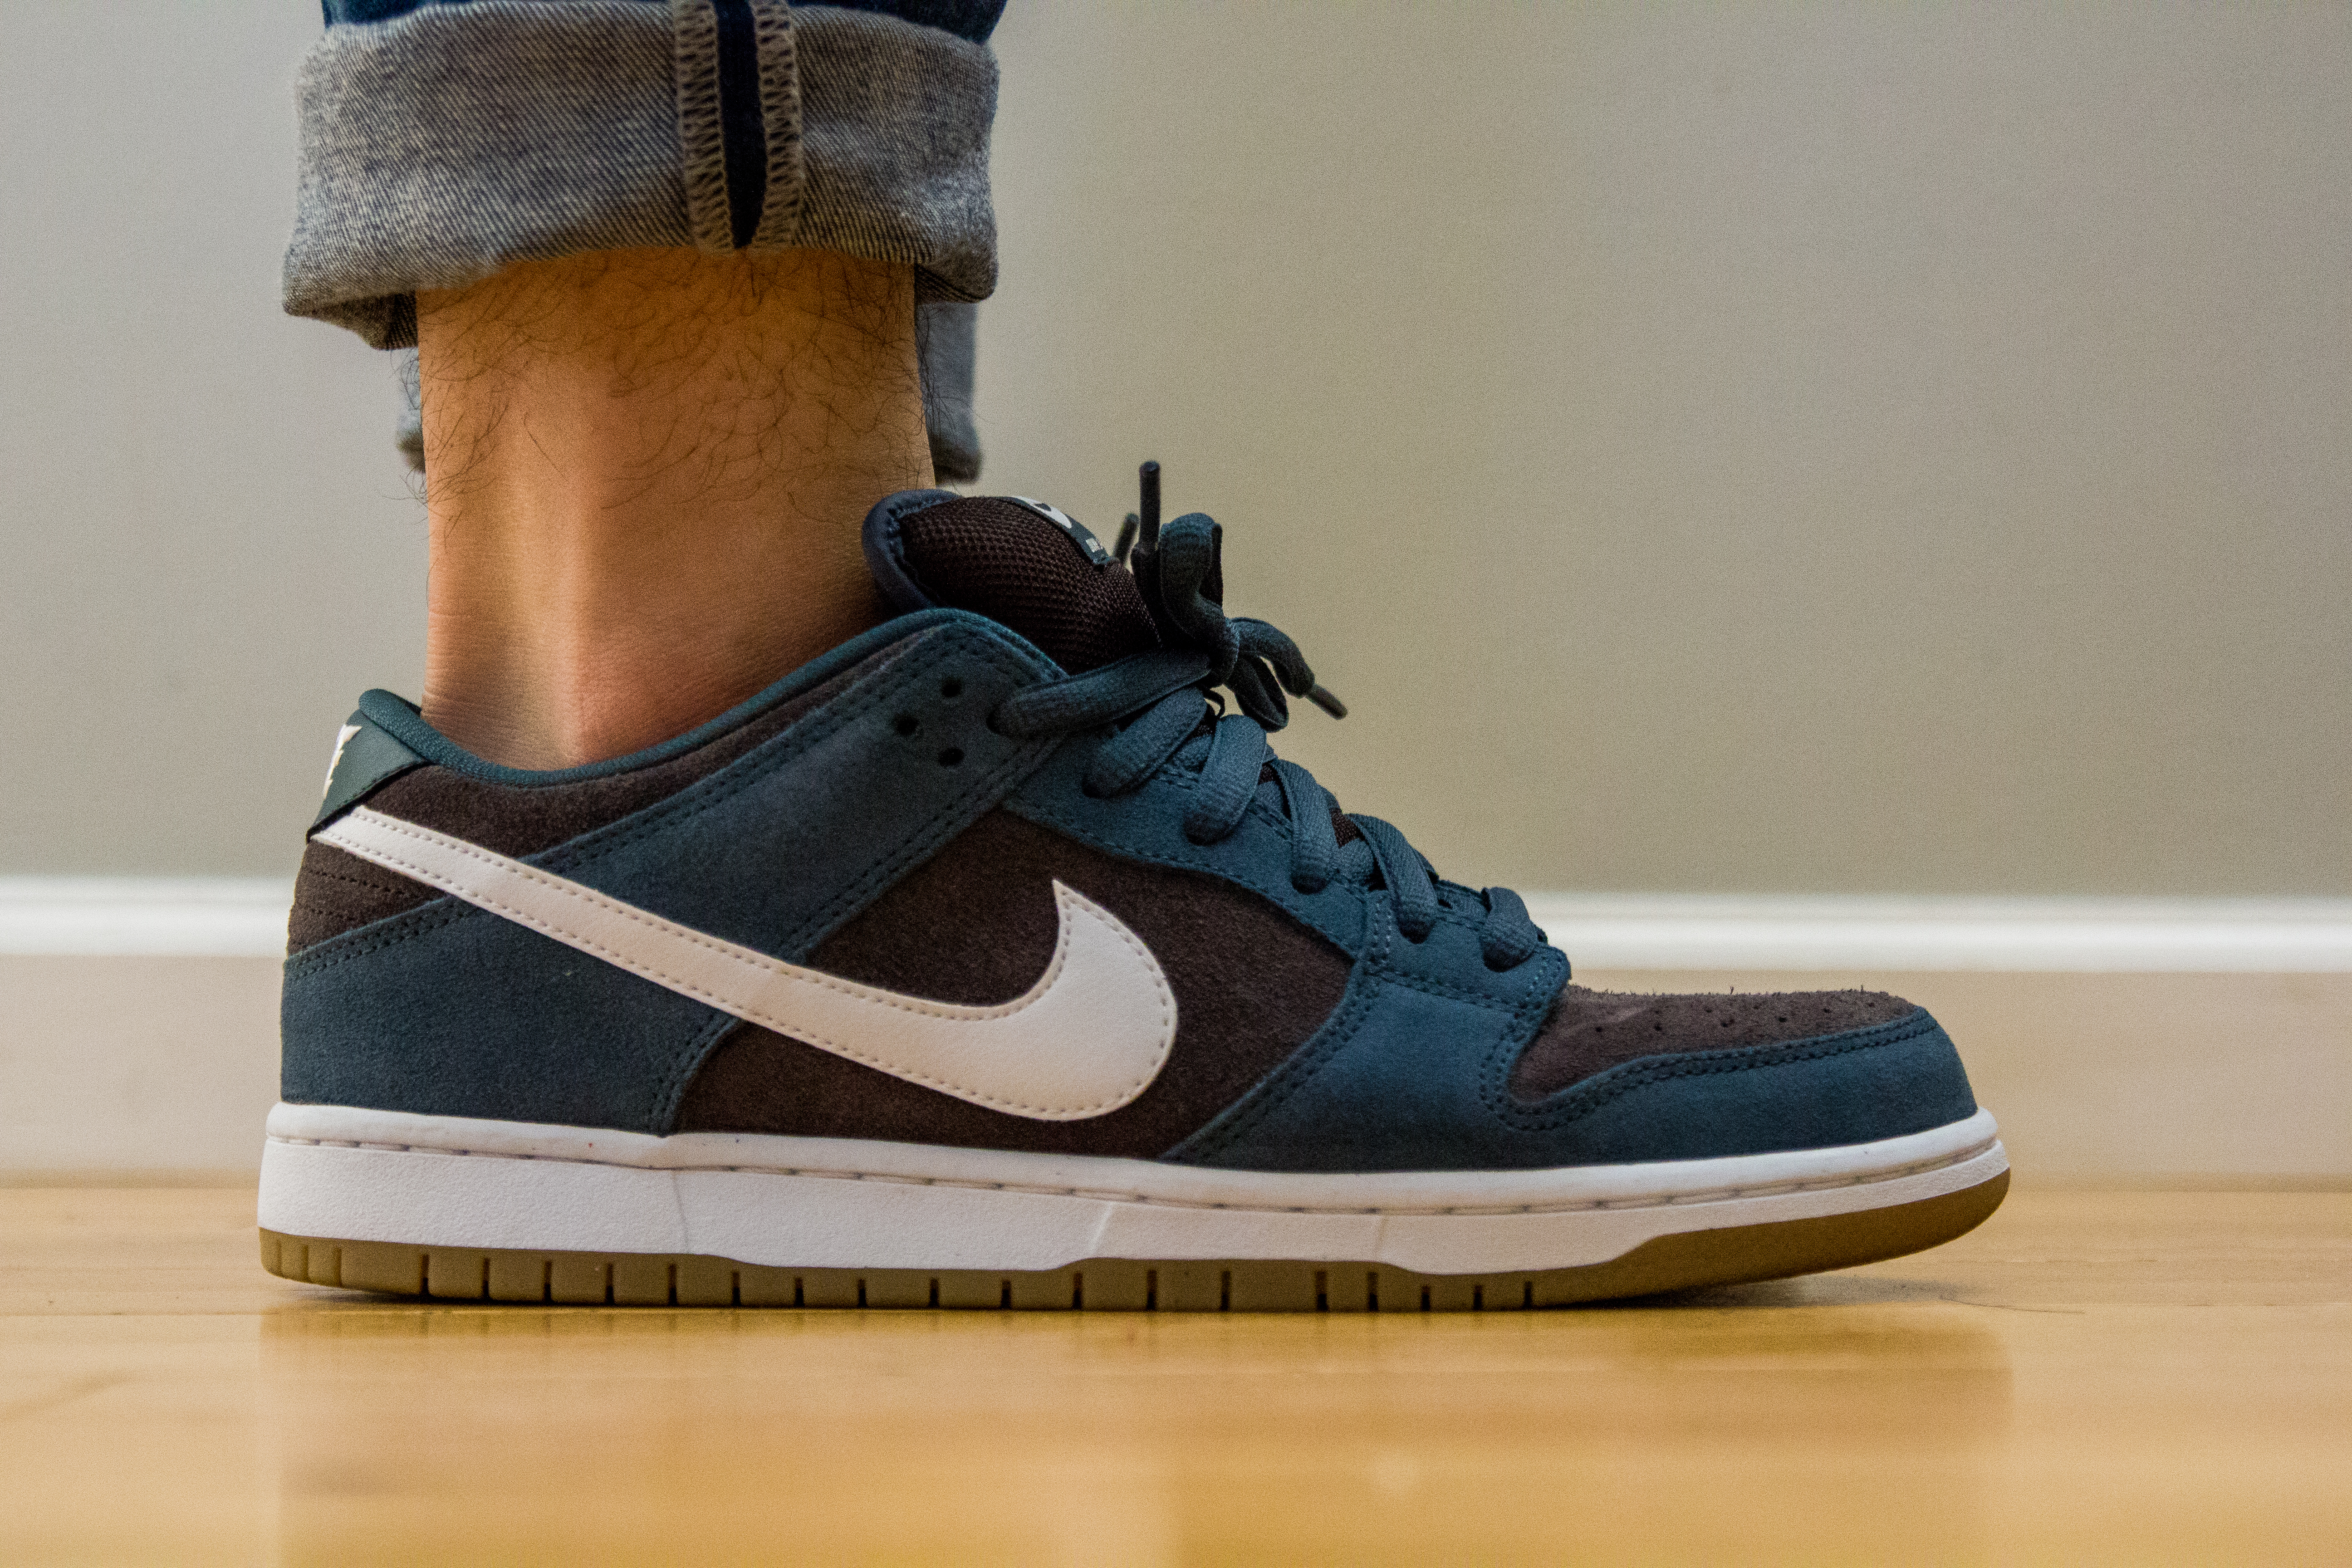 e05a73c93e41 Nike SB Slate Blue (aka Futura II) on Feet by grafitup on DeviantArt